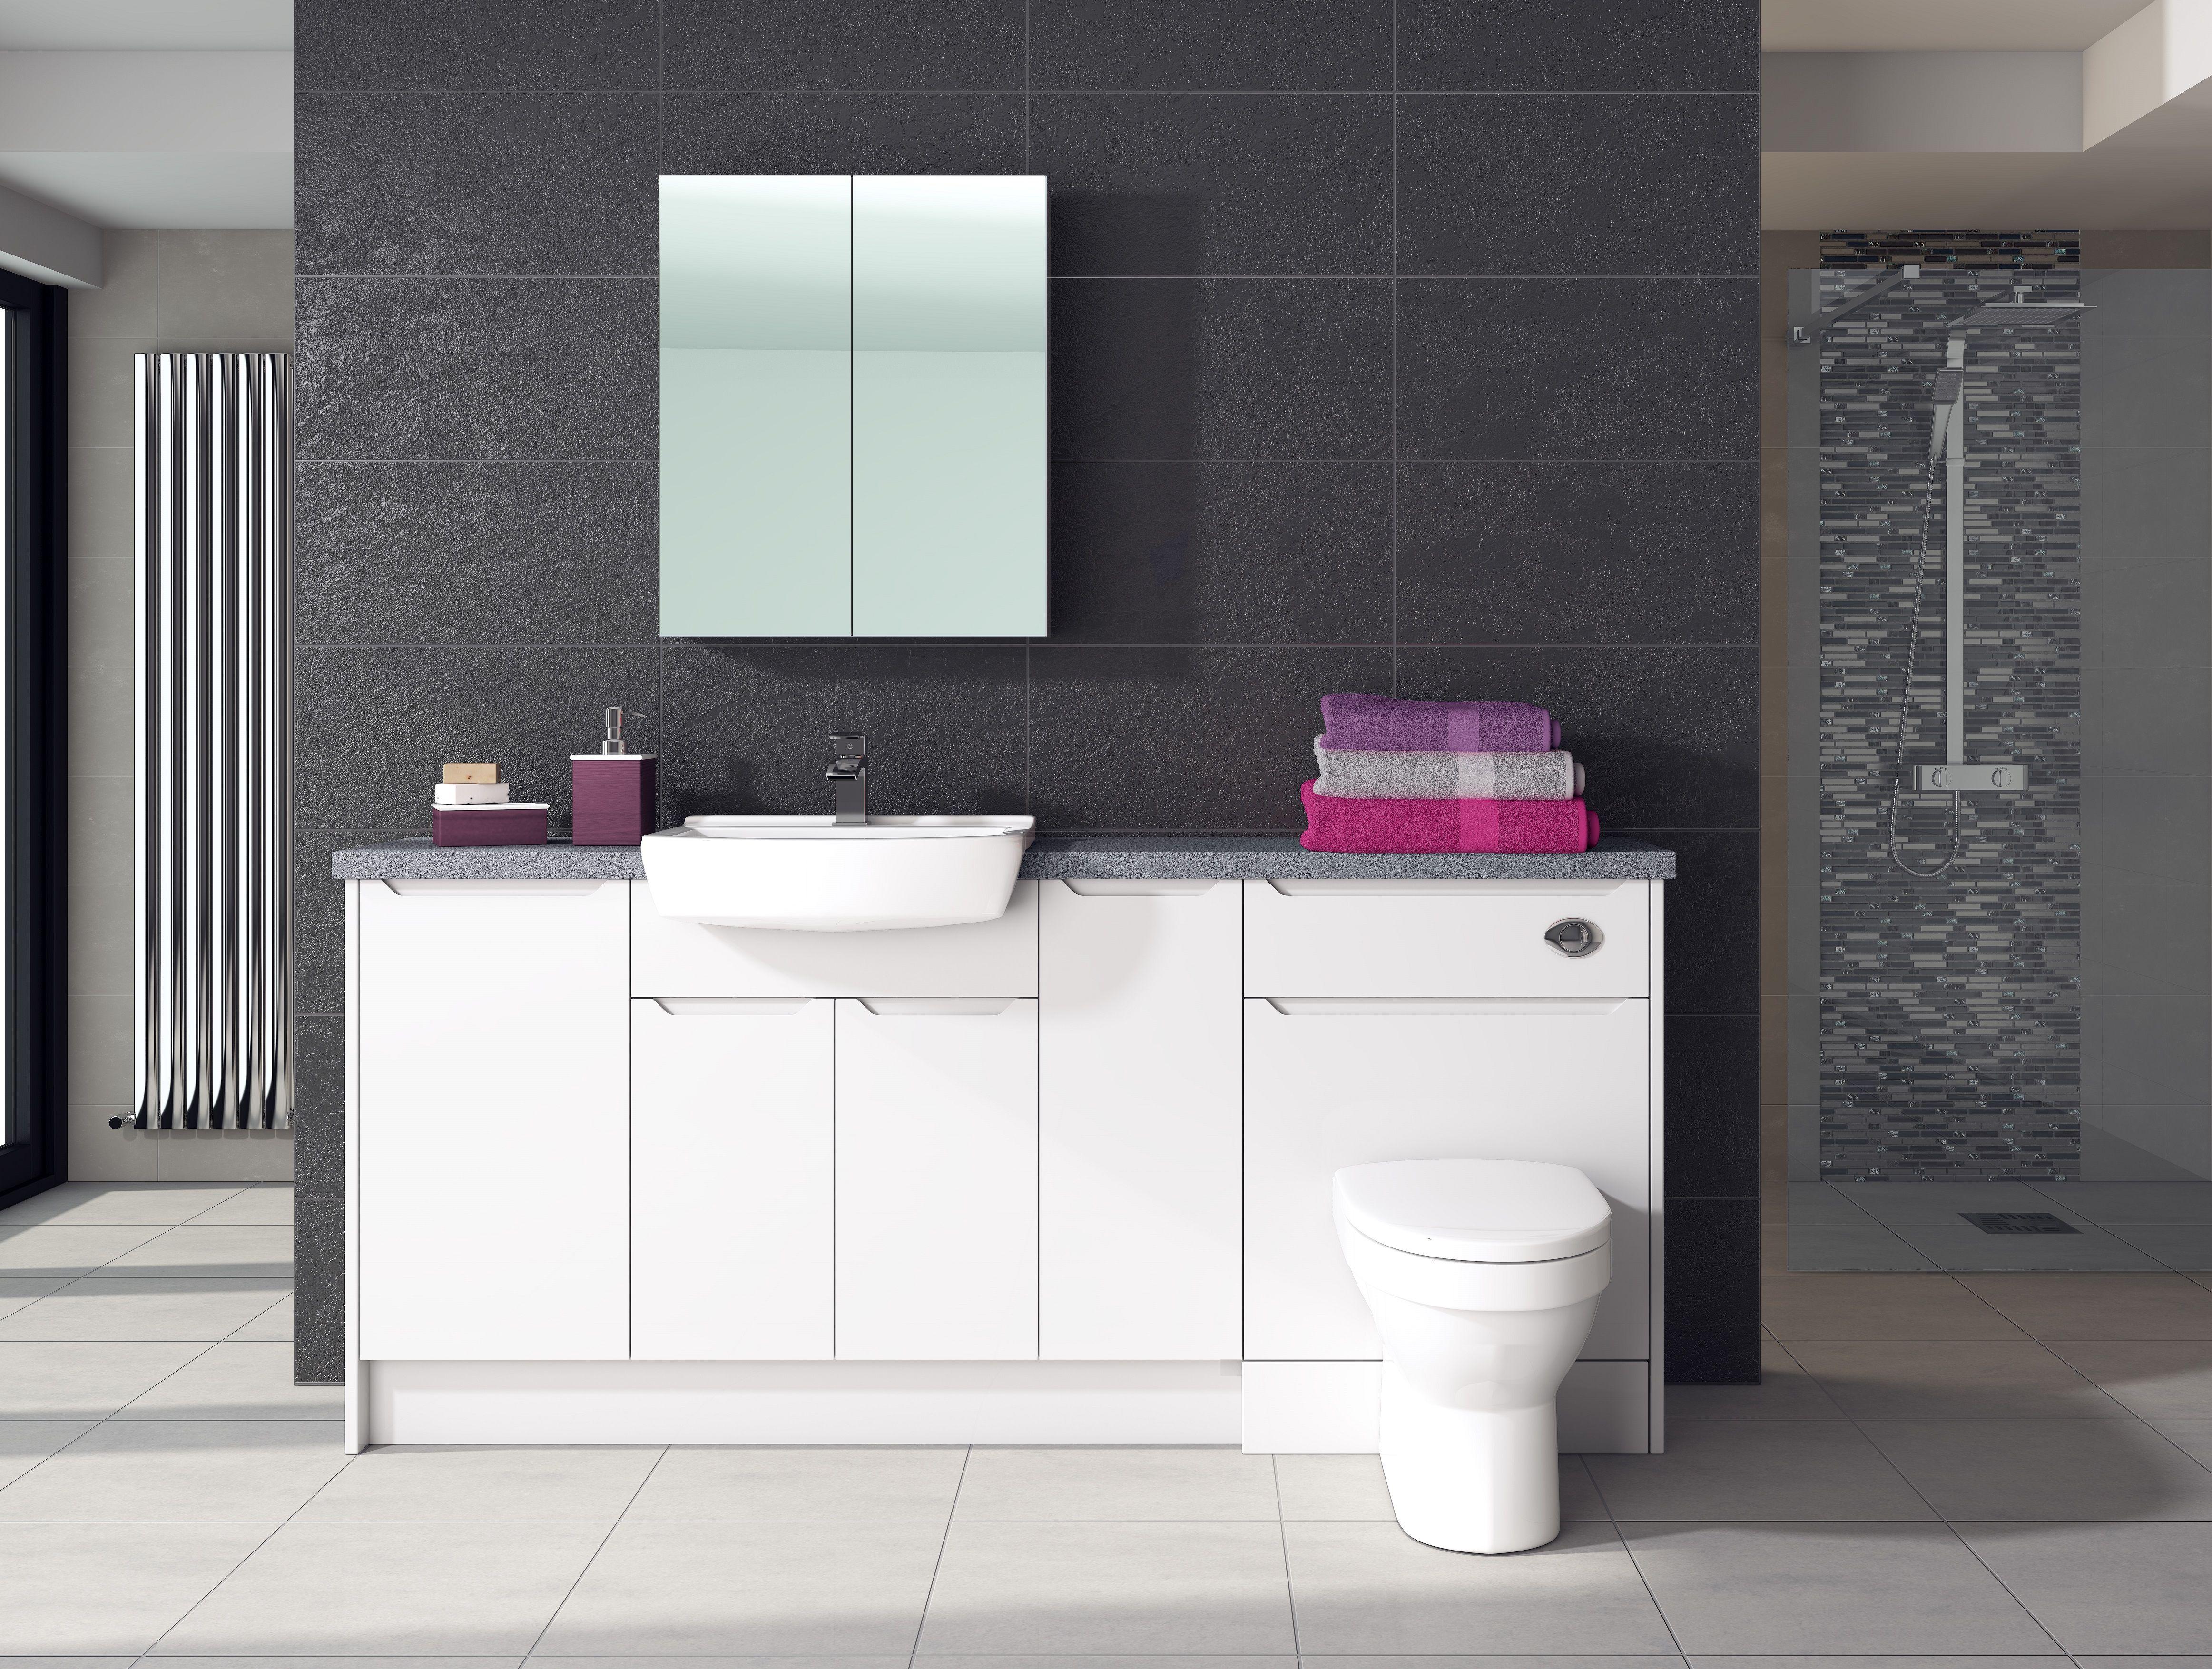 Amaris White Gloss Sculptured Fitted Furniture Visit Www Balterleybathroomfurniture Co U Fitted Furniture Fitted Bathroom Furniture Bathroom Furniture Modern